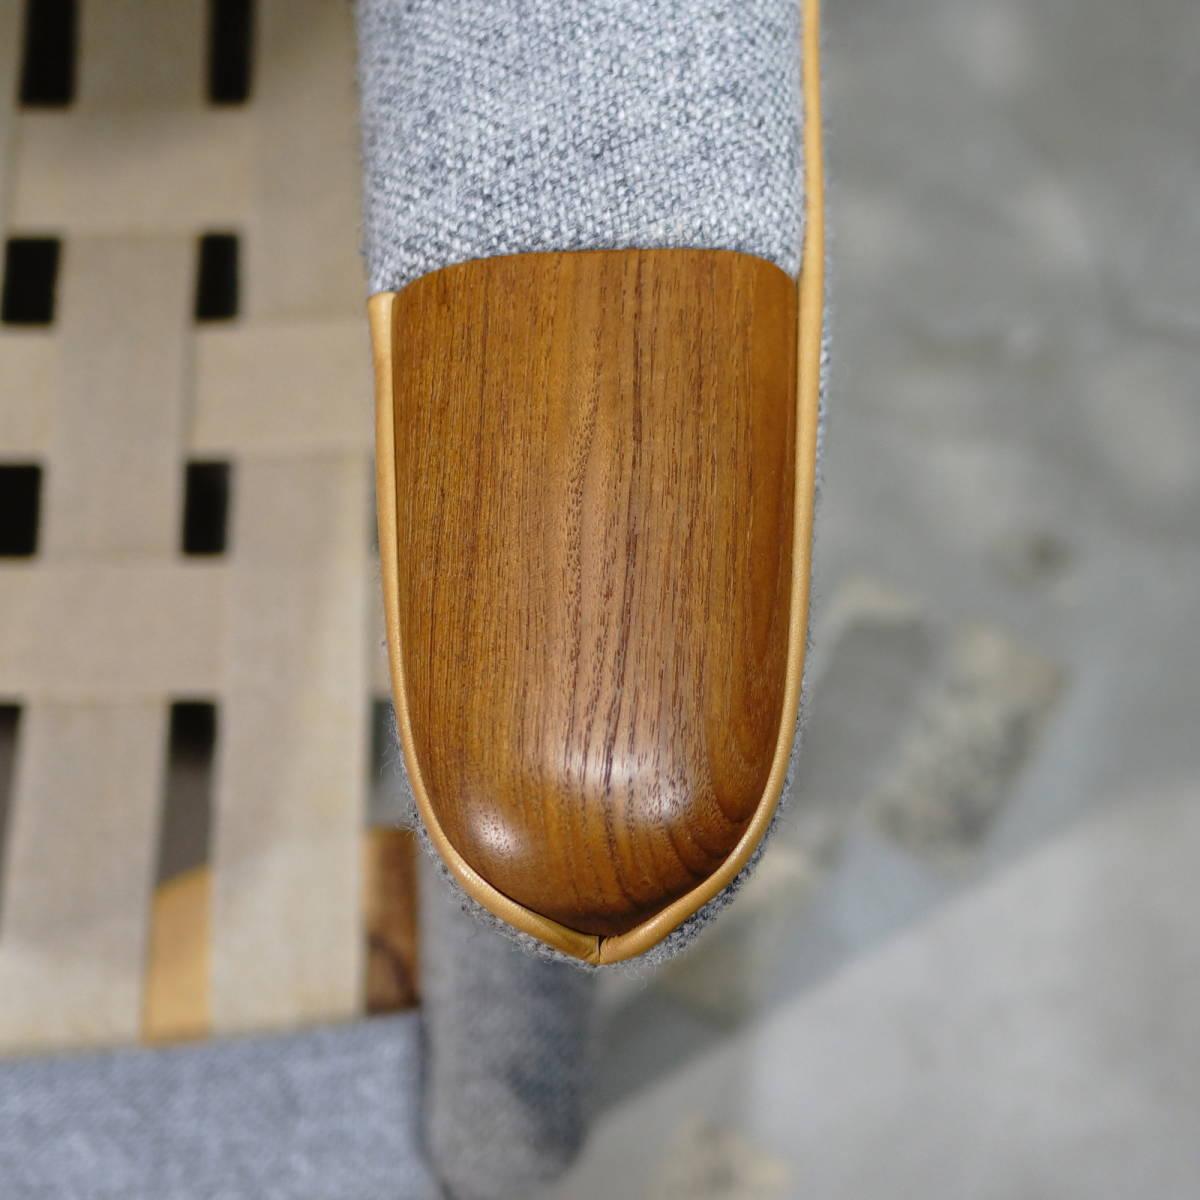 Hans J. Wegner ウェグナー AP-19 Bear Chair ベアチェア Teak & Oak チークオーク ※フィンユール モーエンセン_画像8